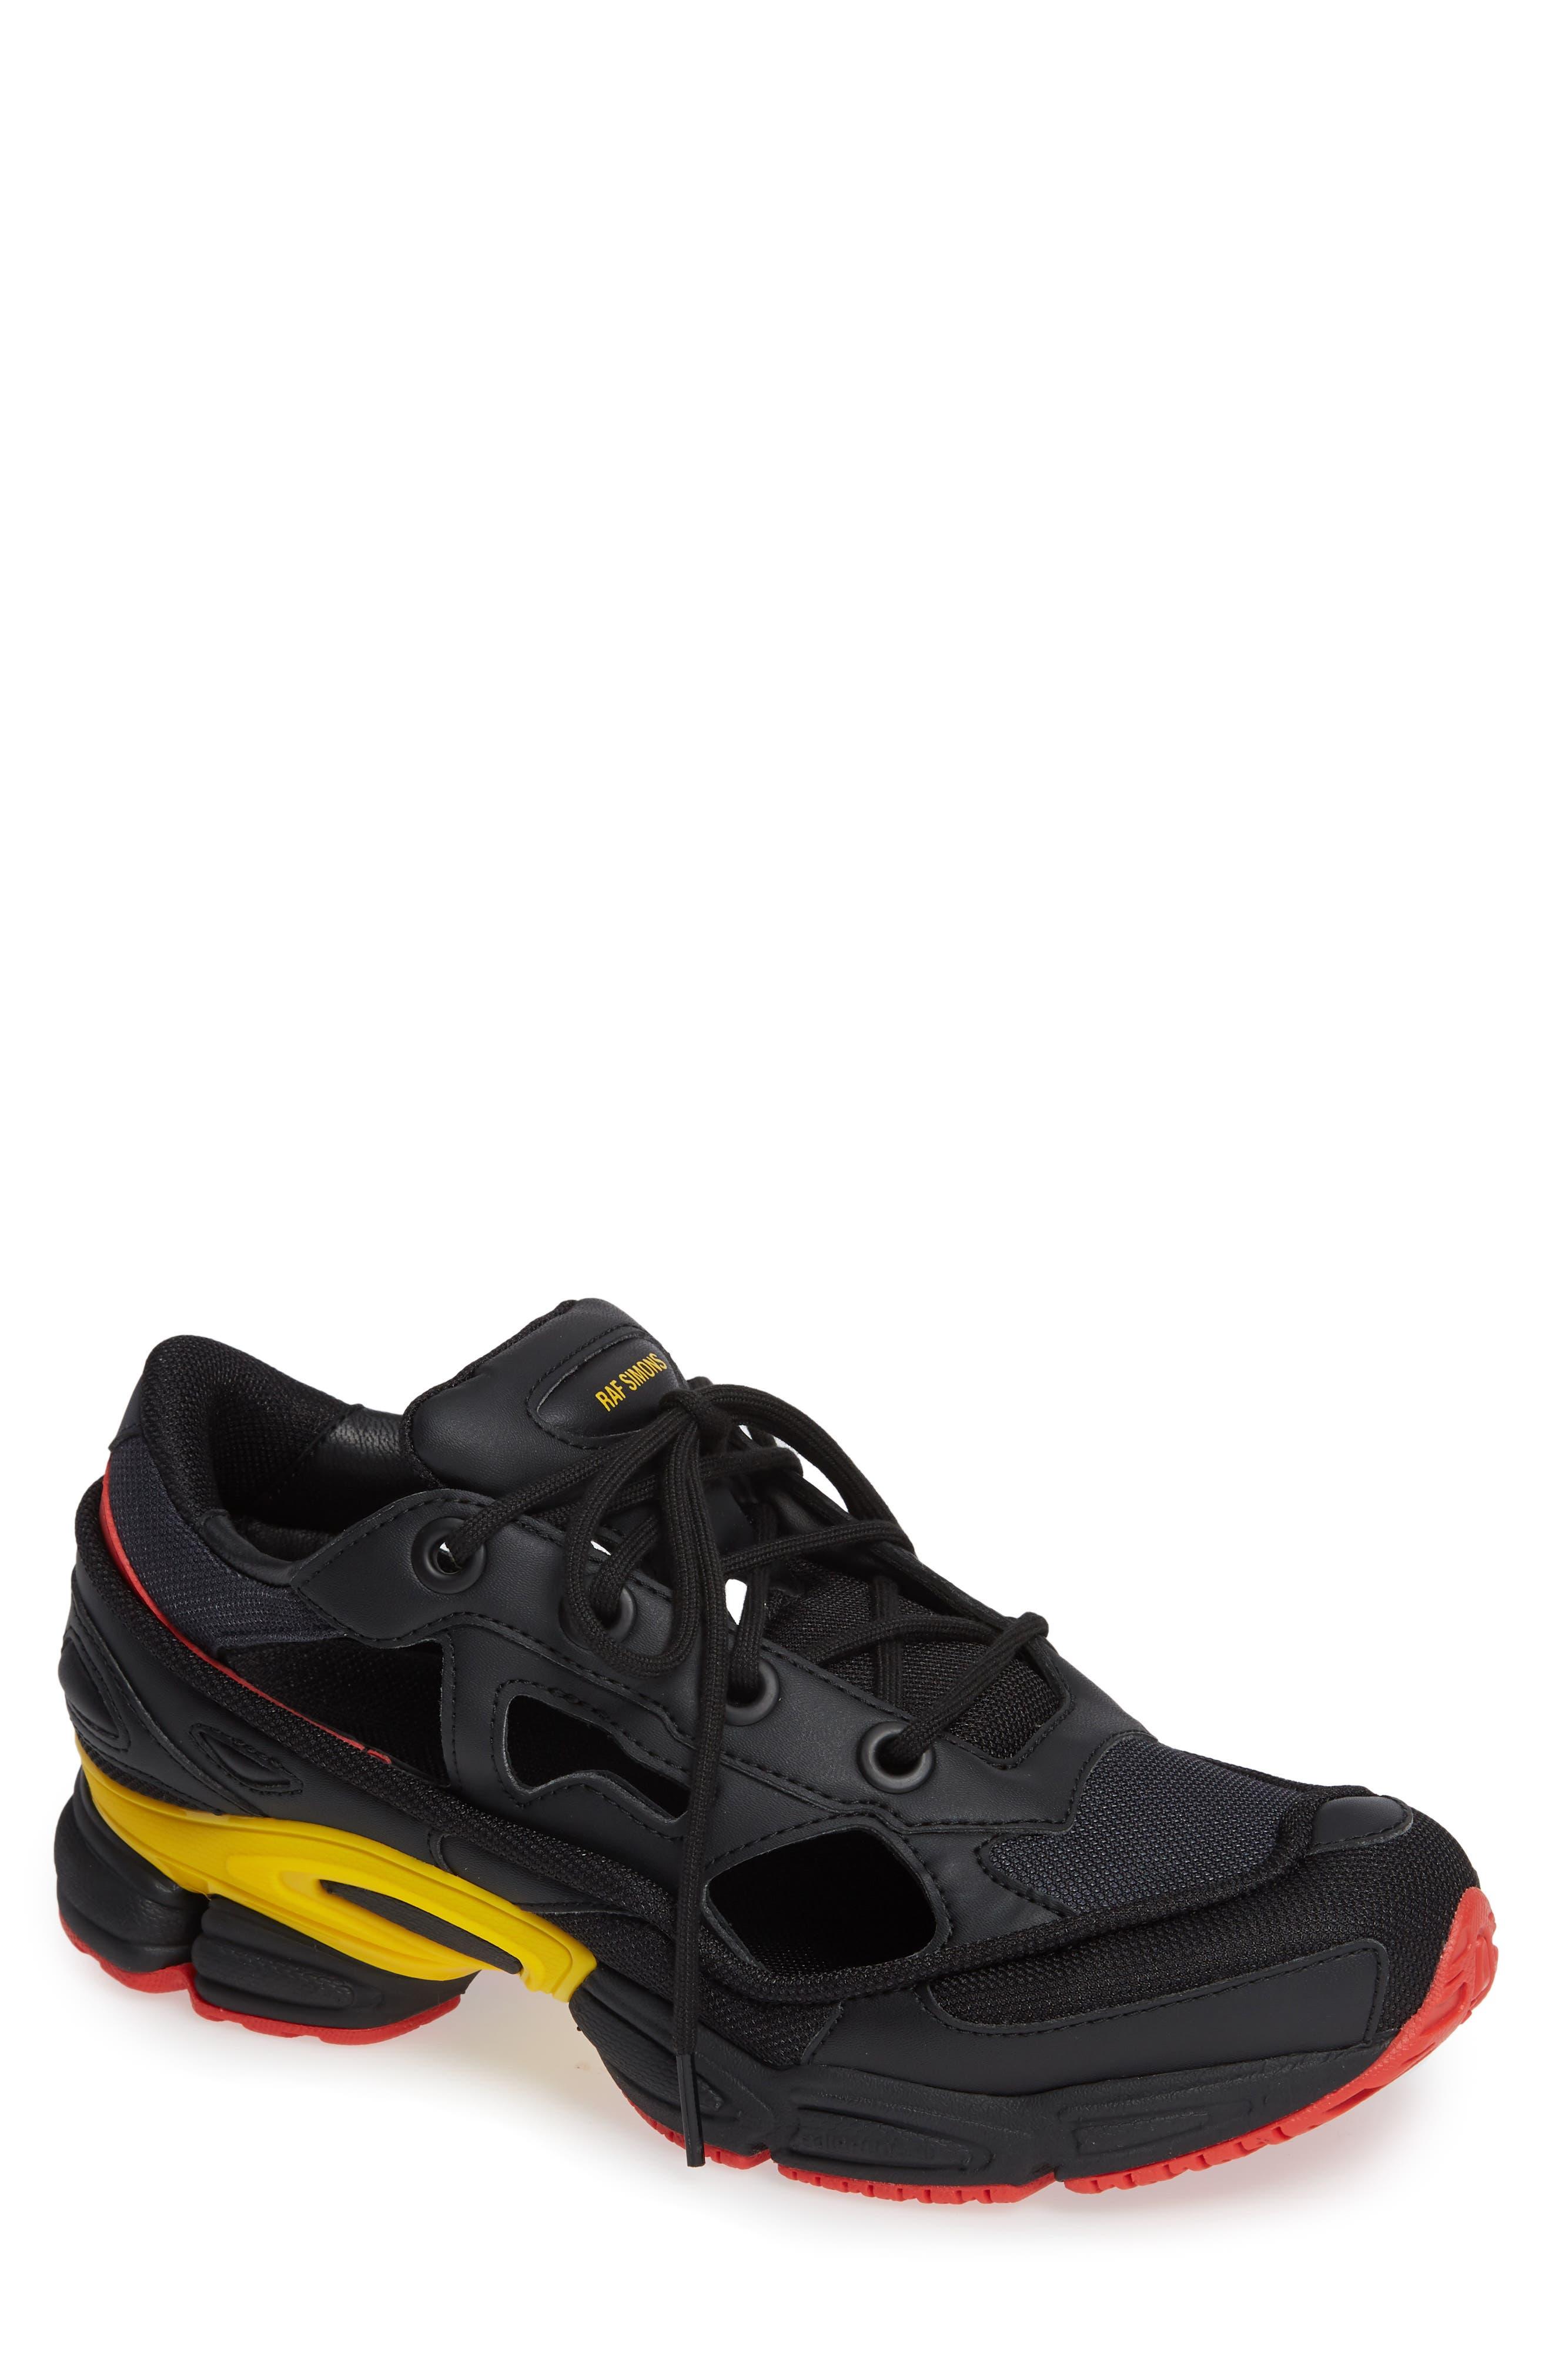 adidas by Raf Simons Replicant Ozweego Sneaker,                             Main thumbnail 1, color,                             001